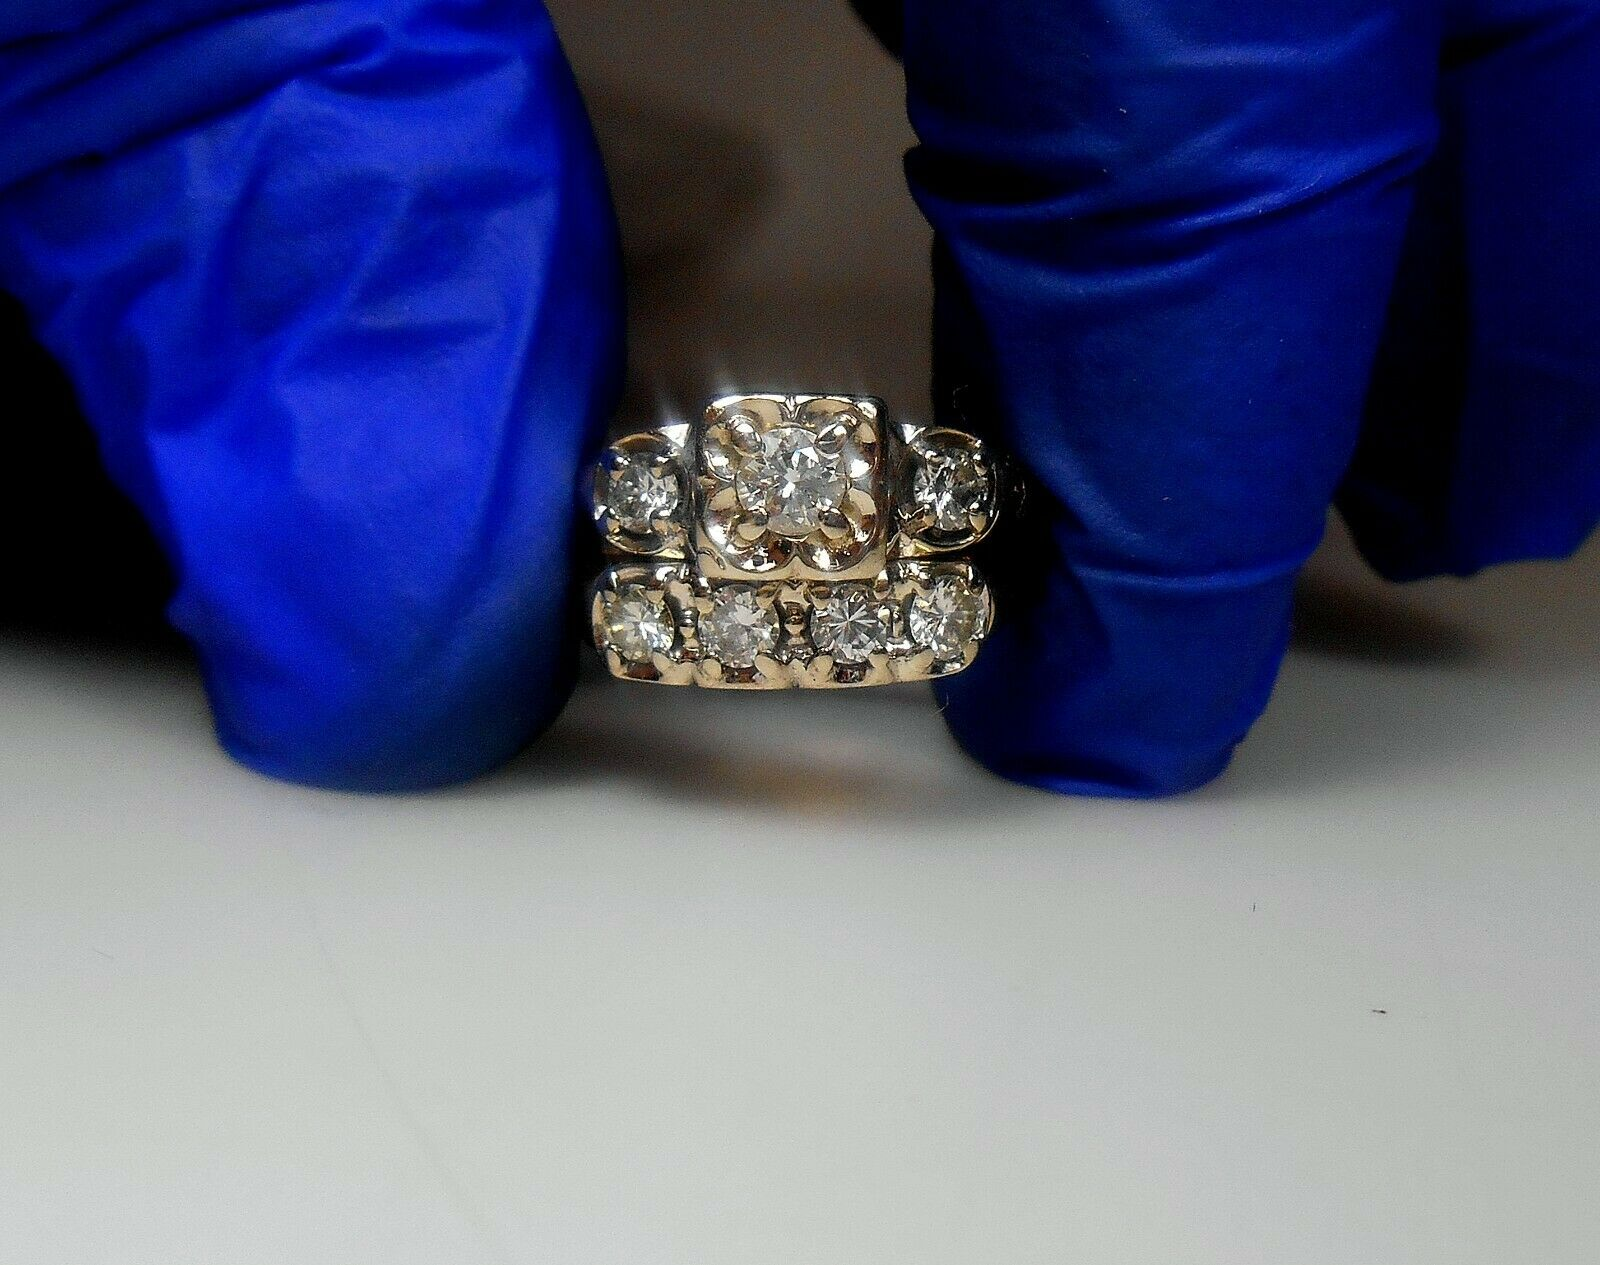 14K SOLID GOLD Antique Art Deco .75ct TW 7 Diamond Wedding Ring Set Sz 7.25 MINT